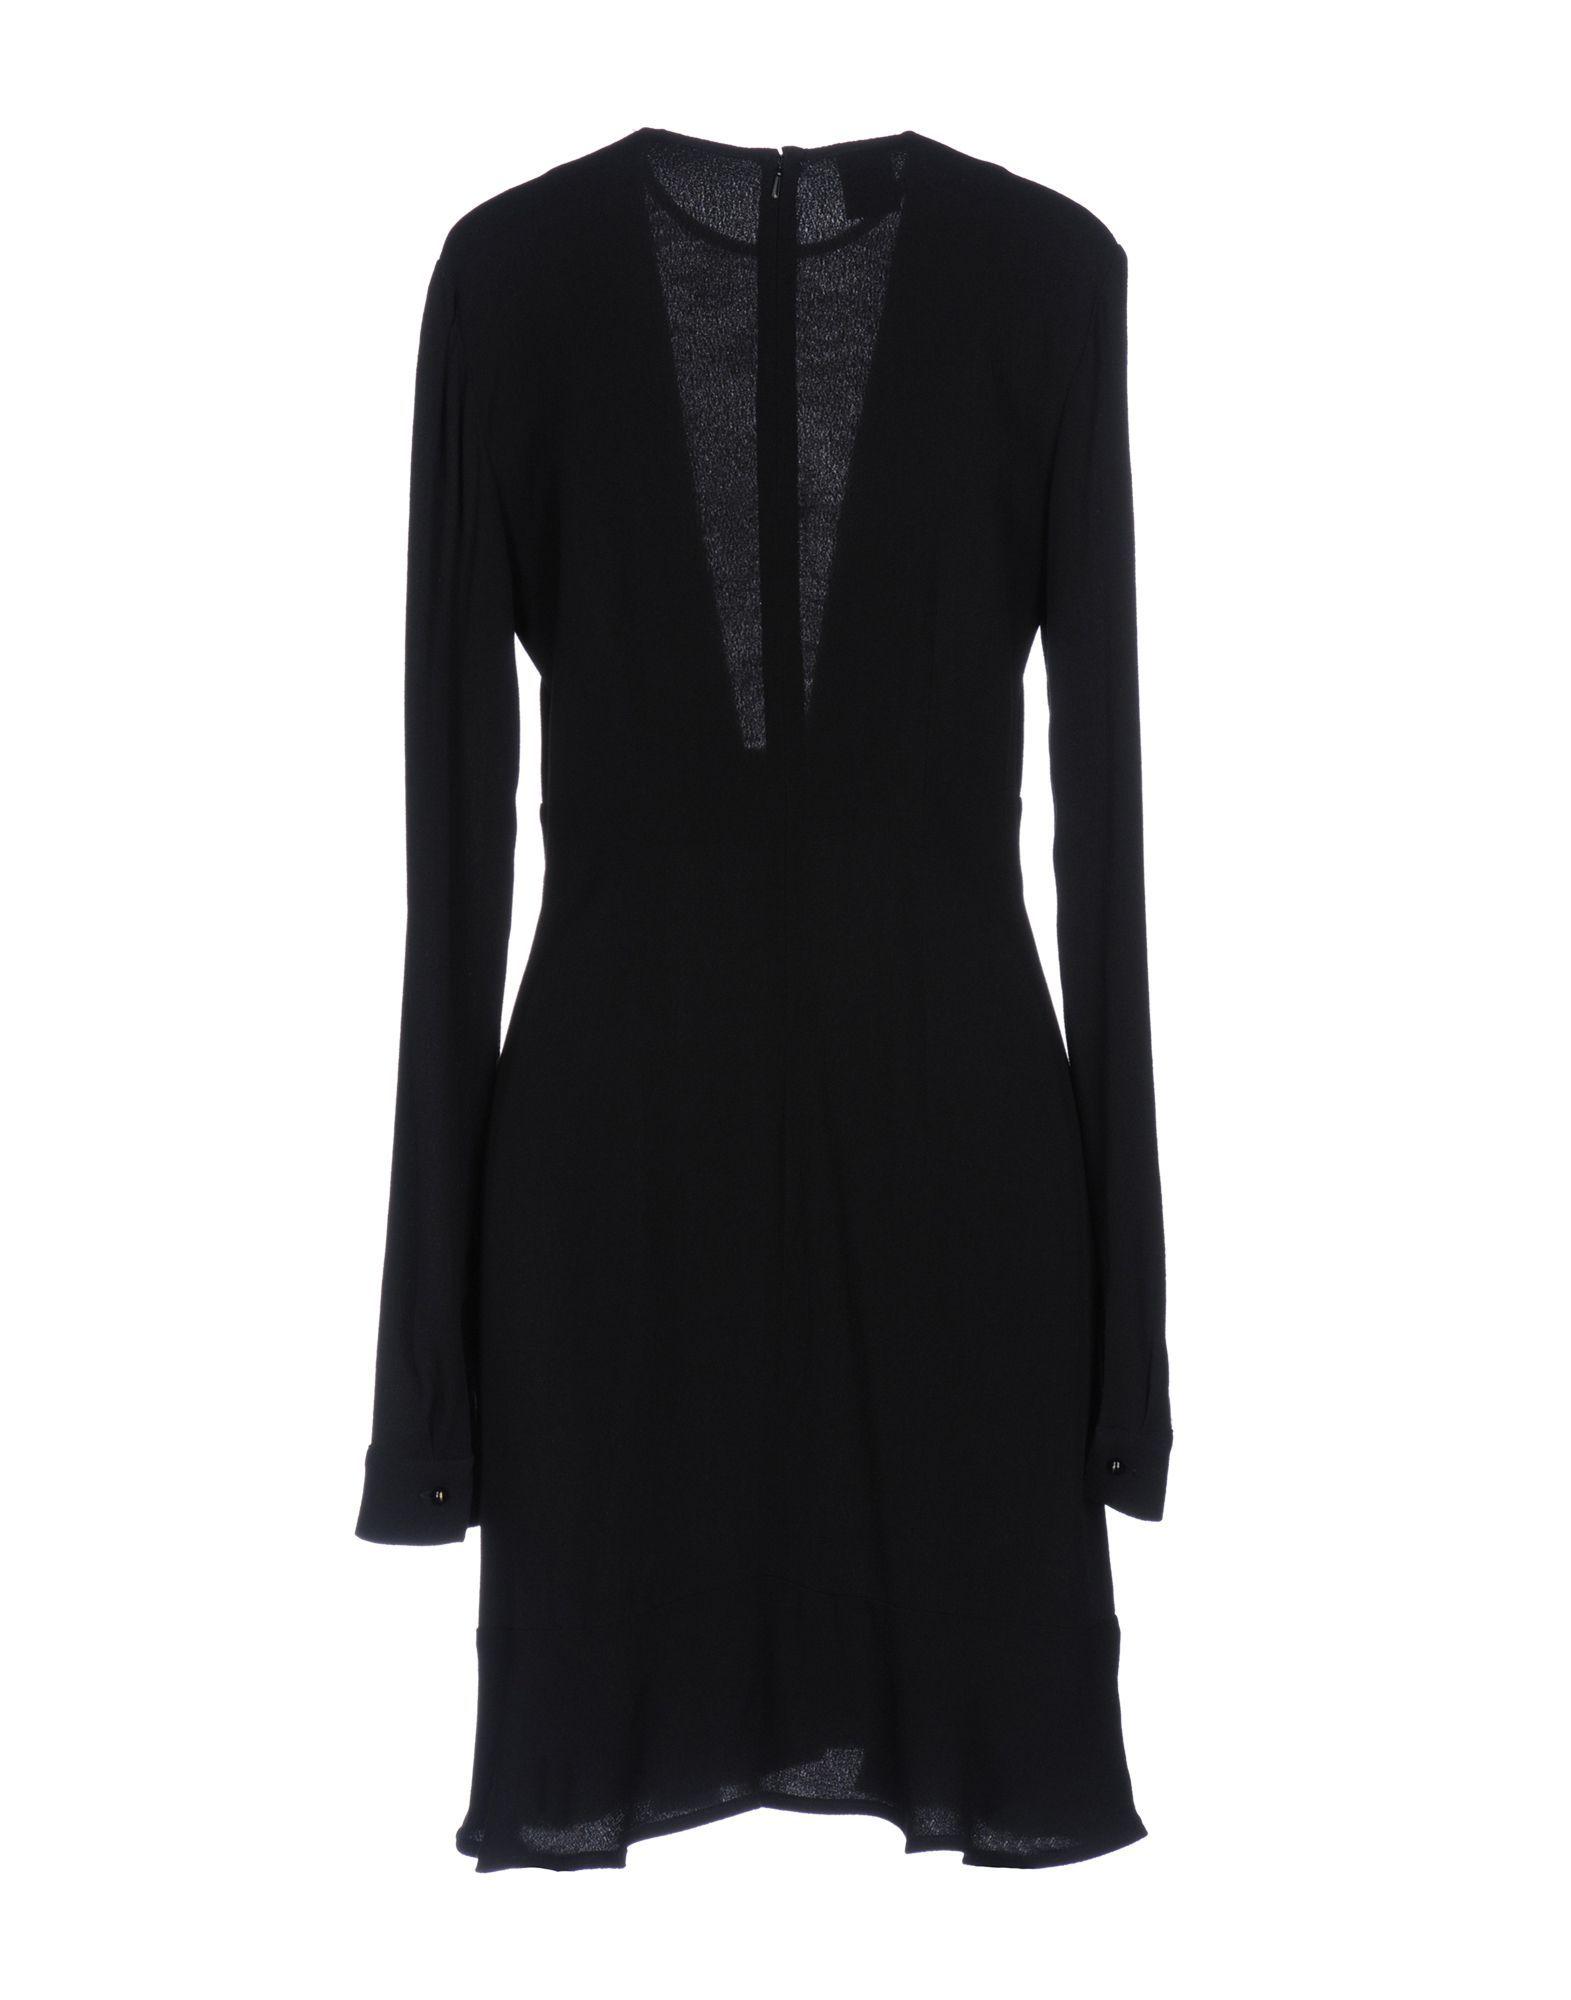 Pinko Black Long Sleeve Dress